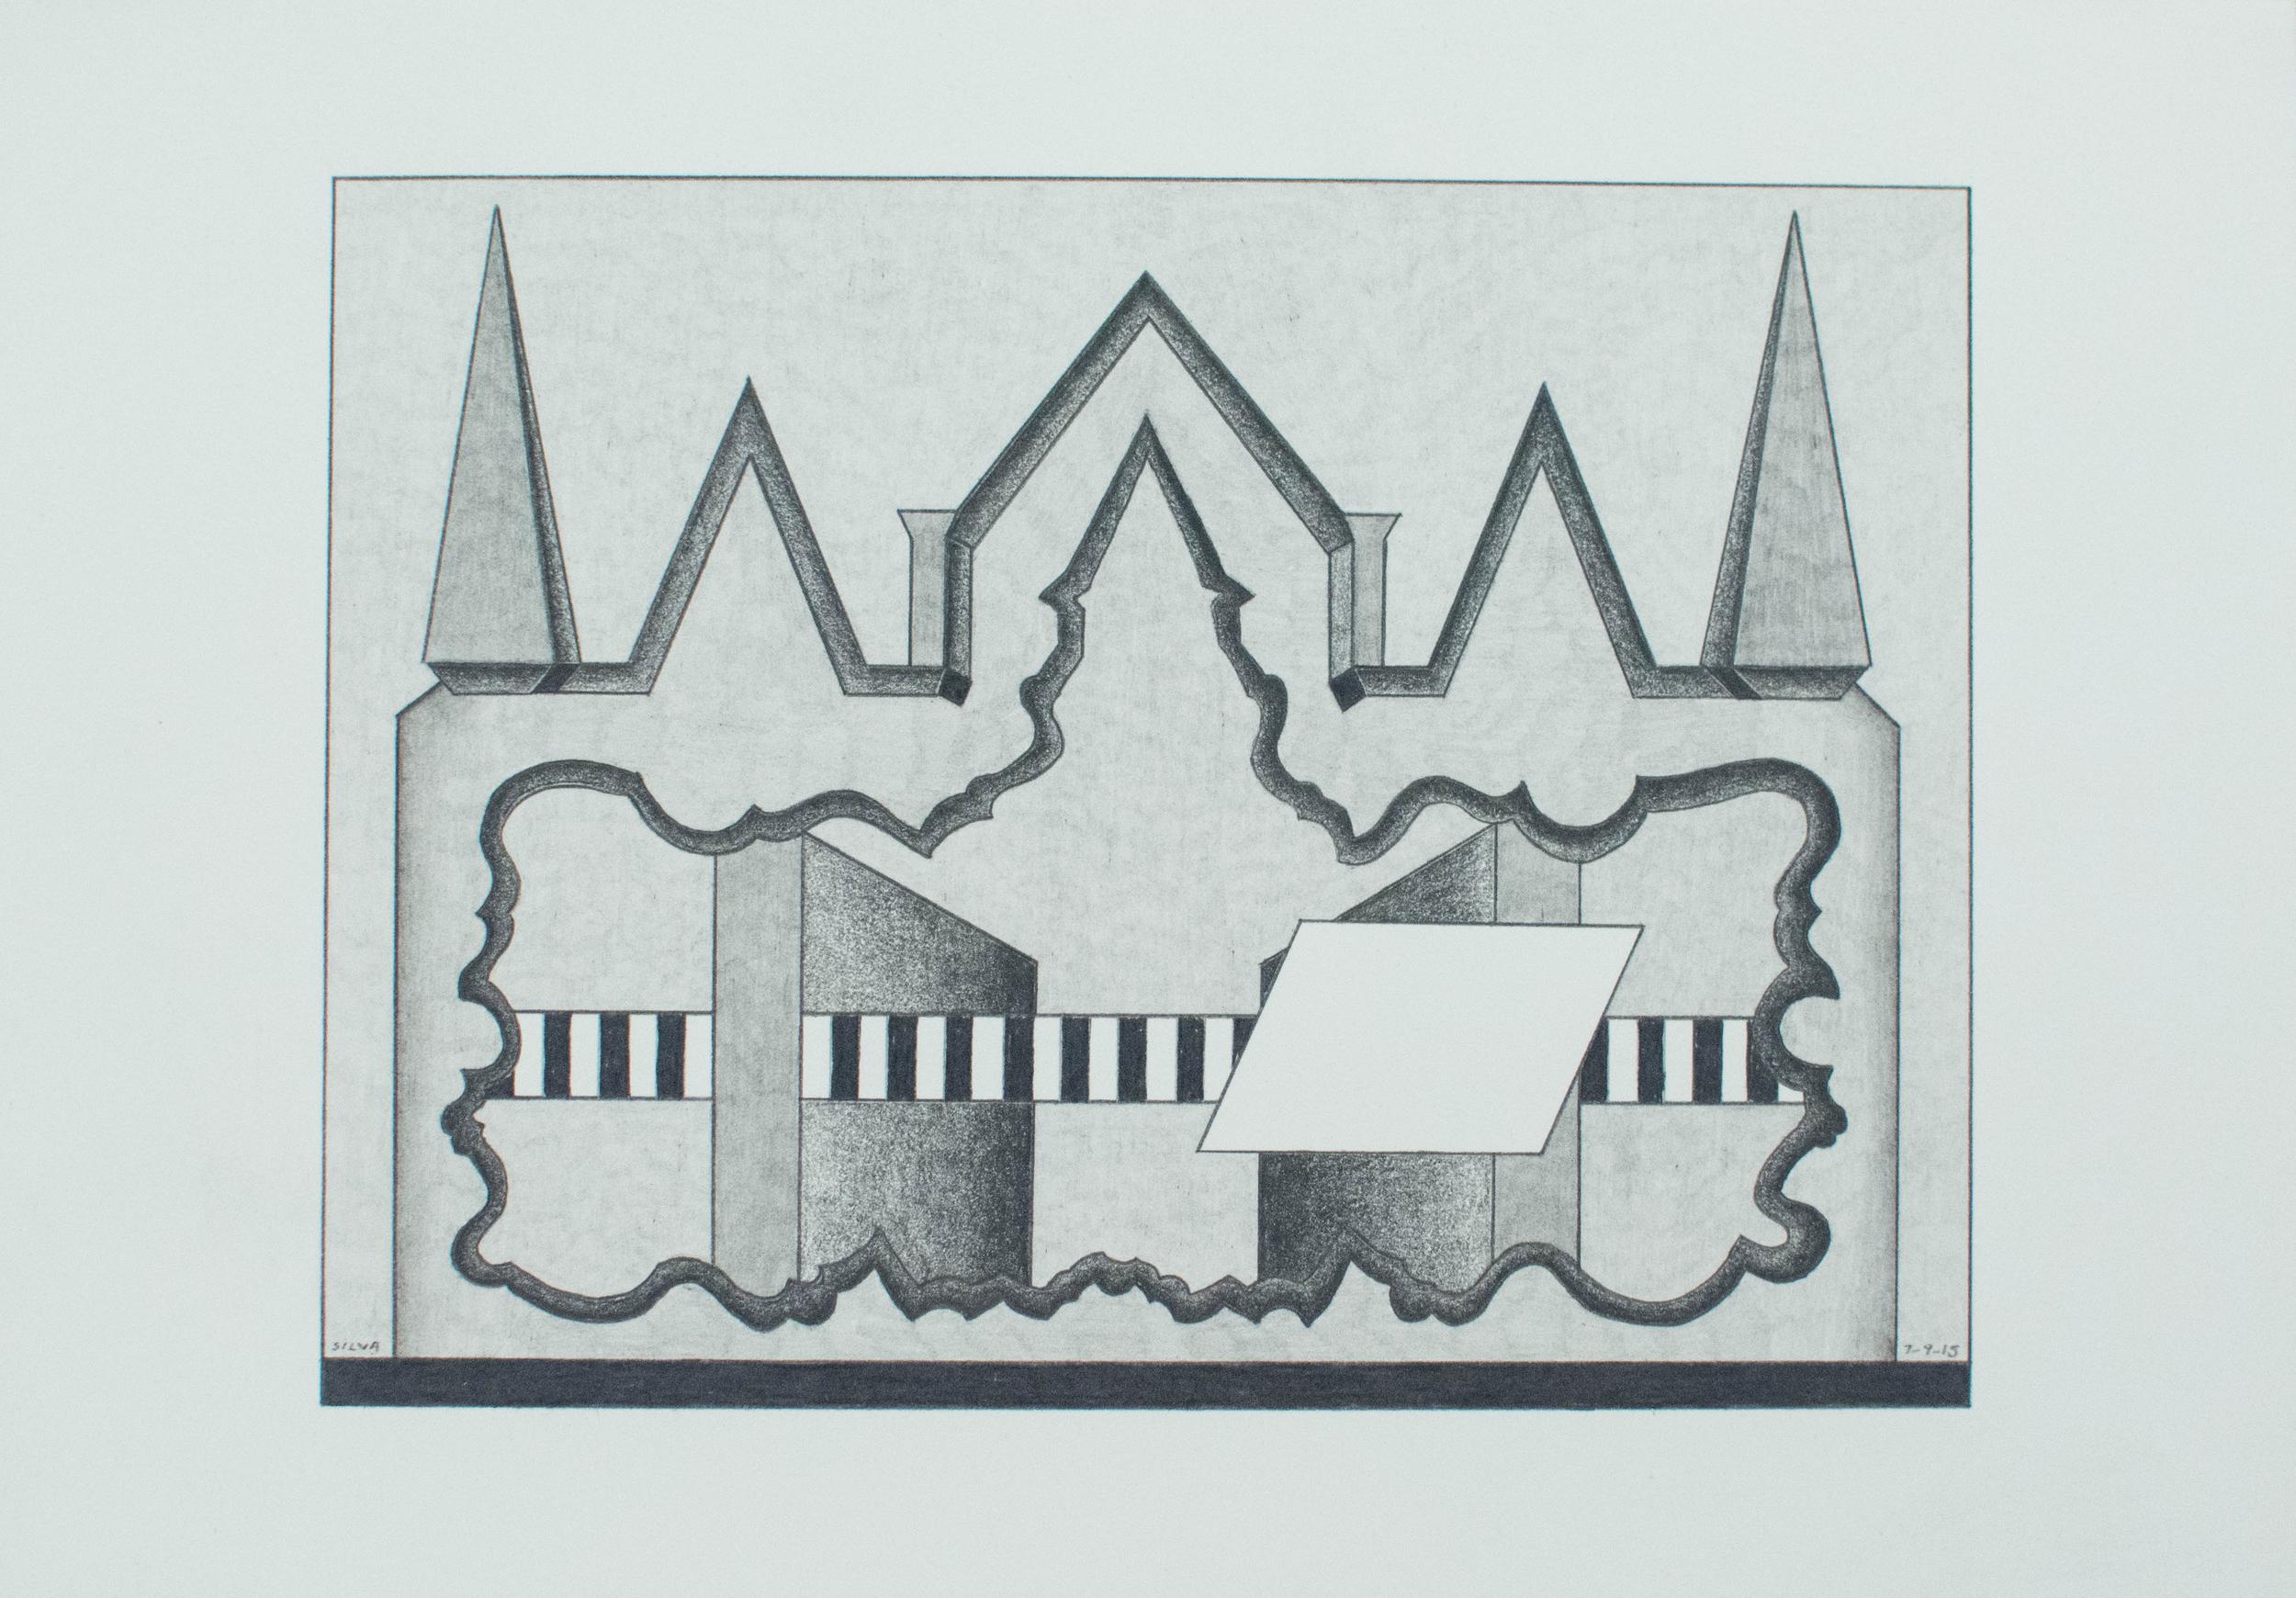 7-9-15, 2015, Graphite on paper, 7 x 10 inches